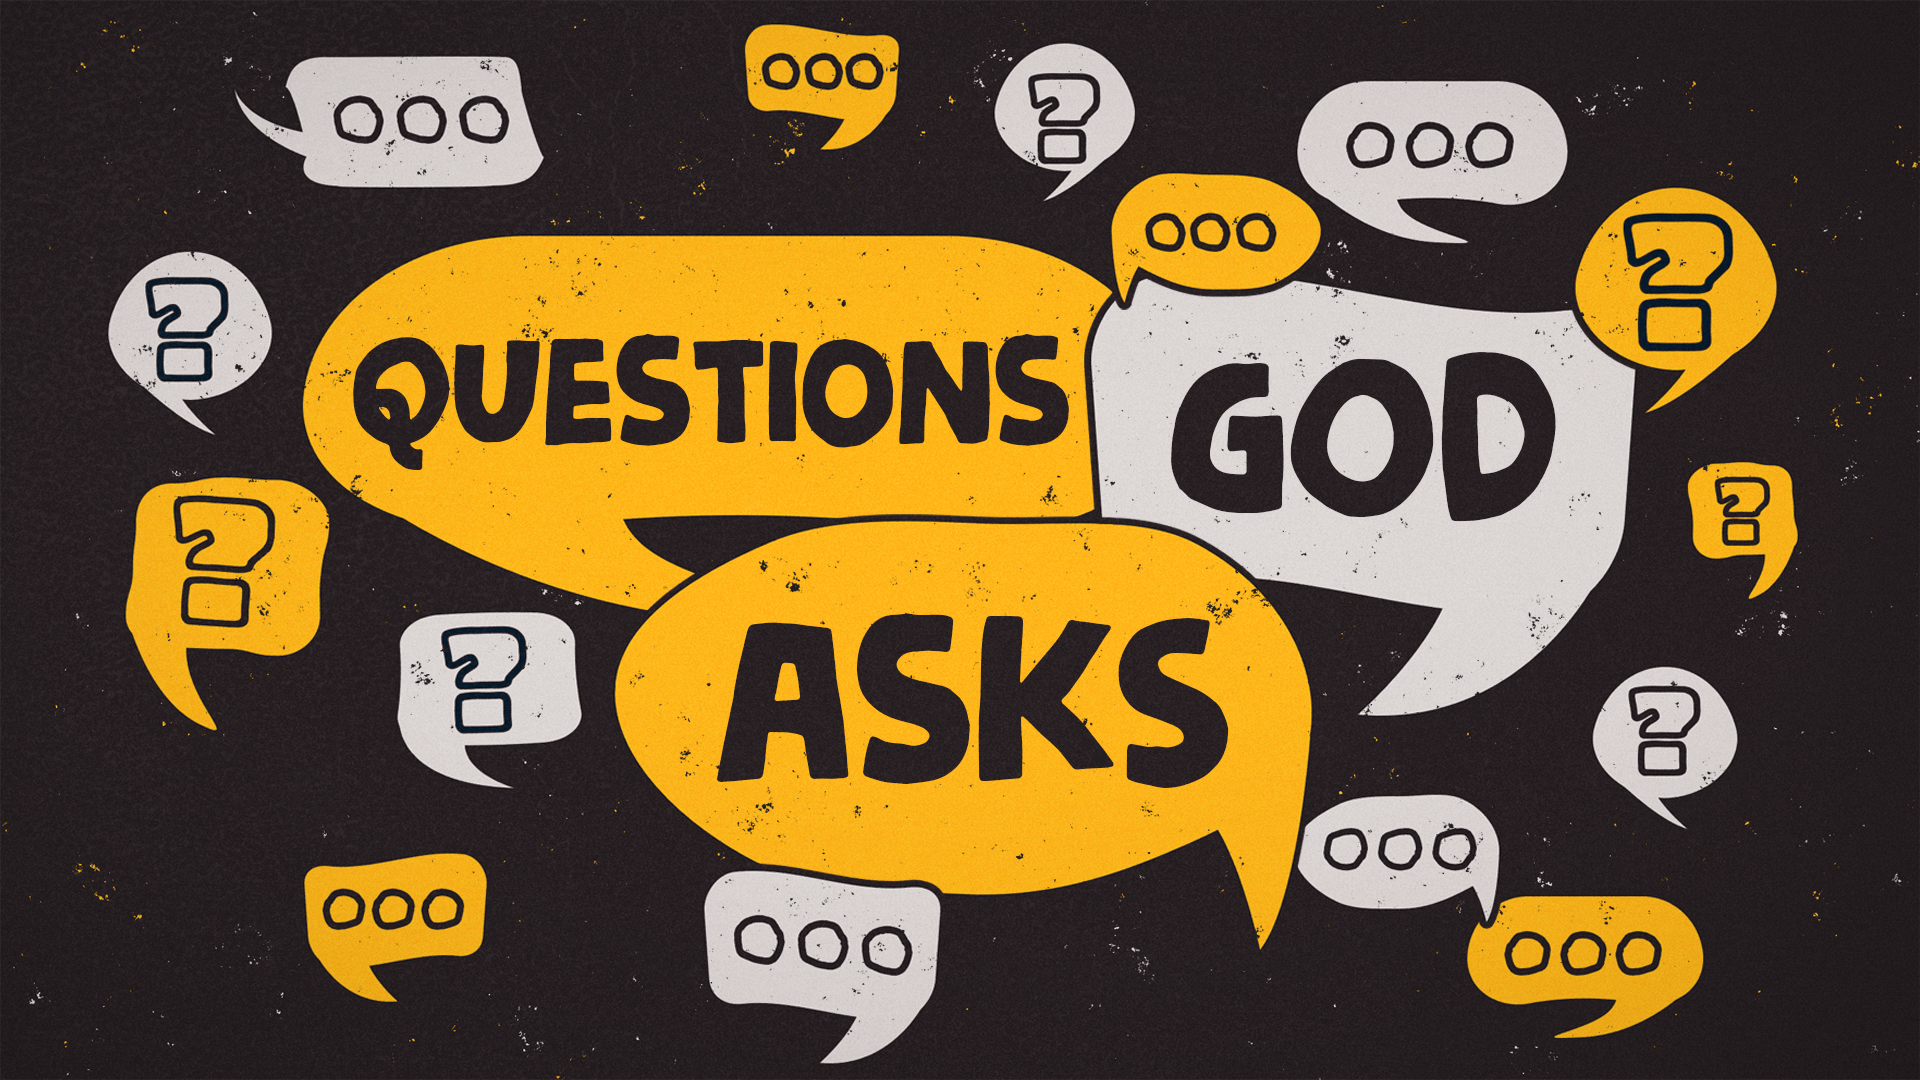 Will I Find Faith on Earth? Image